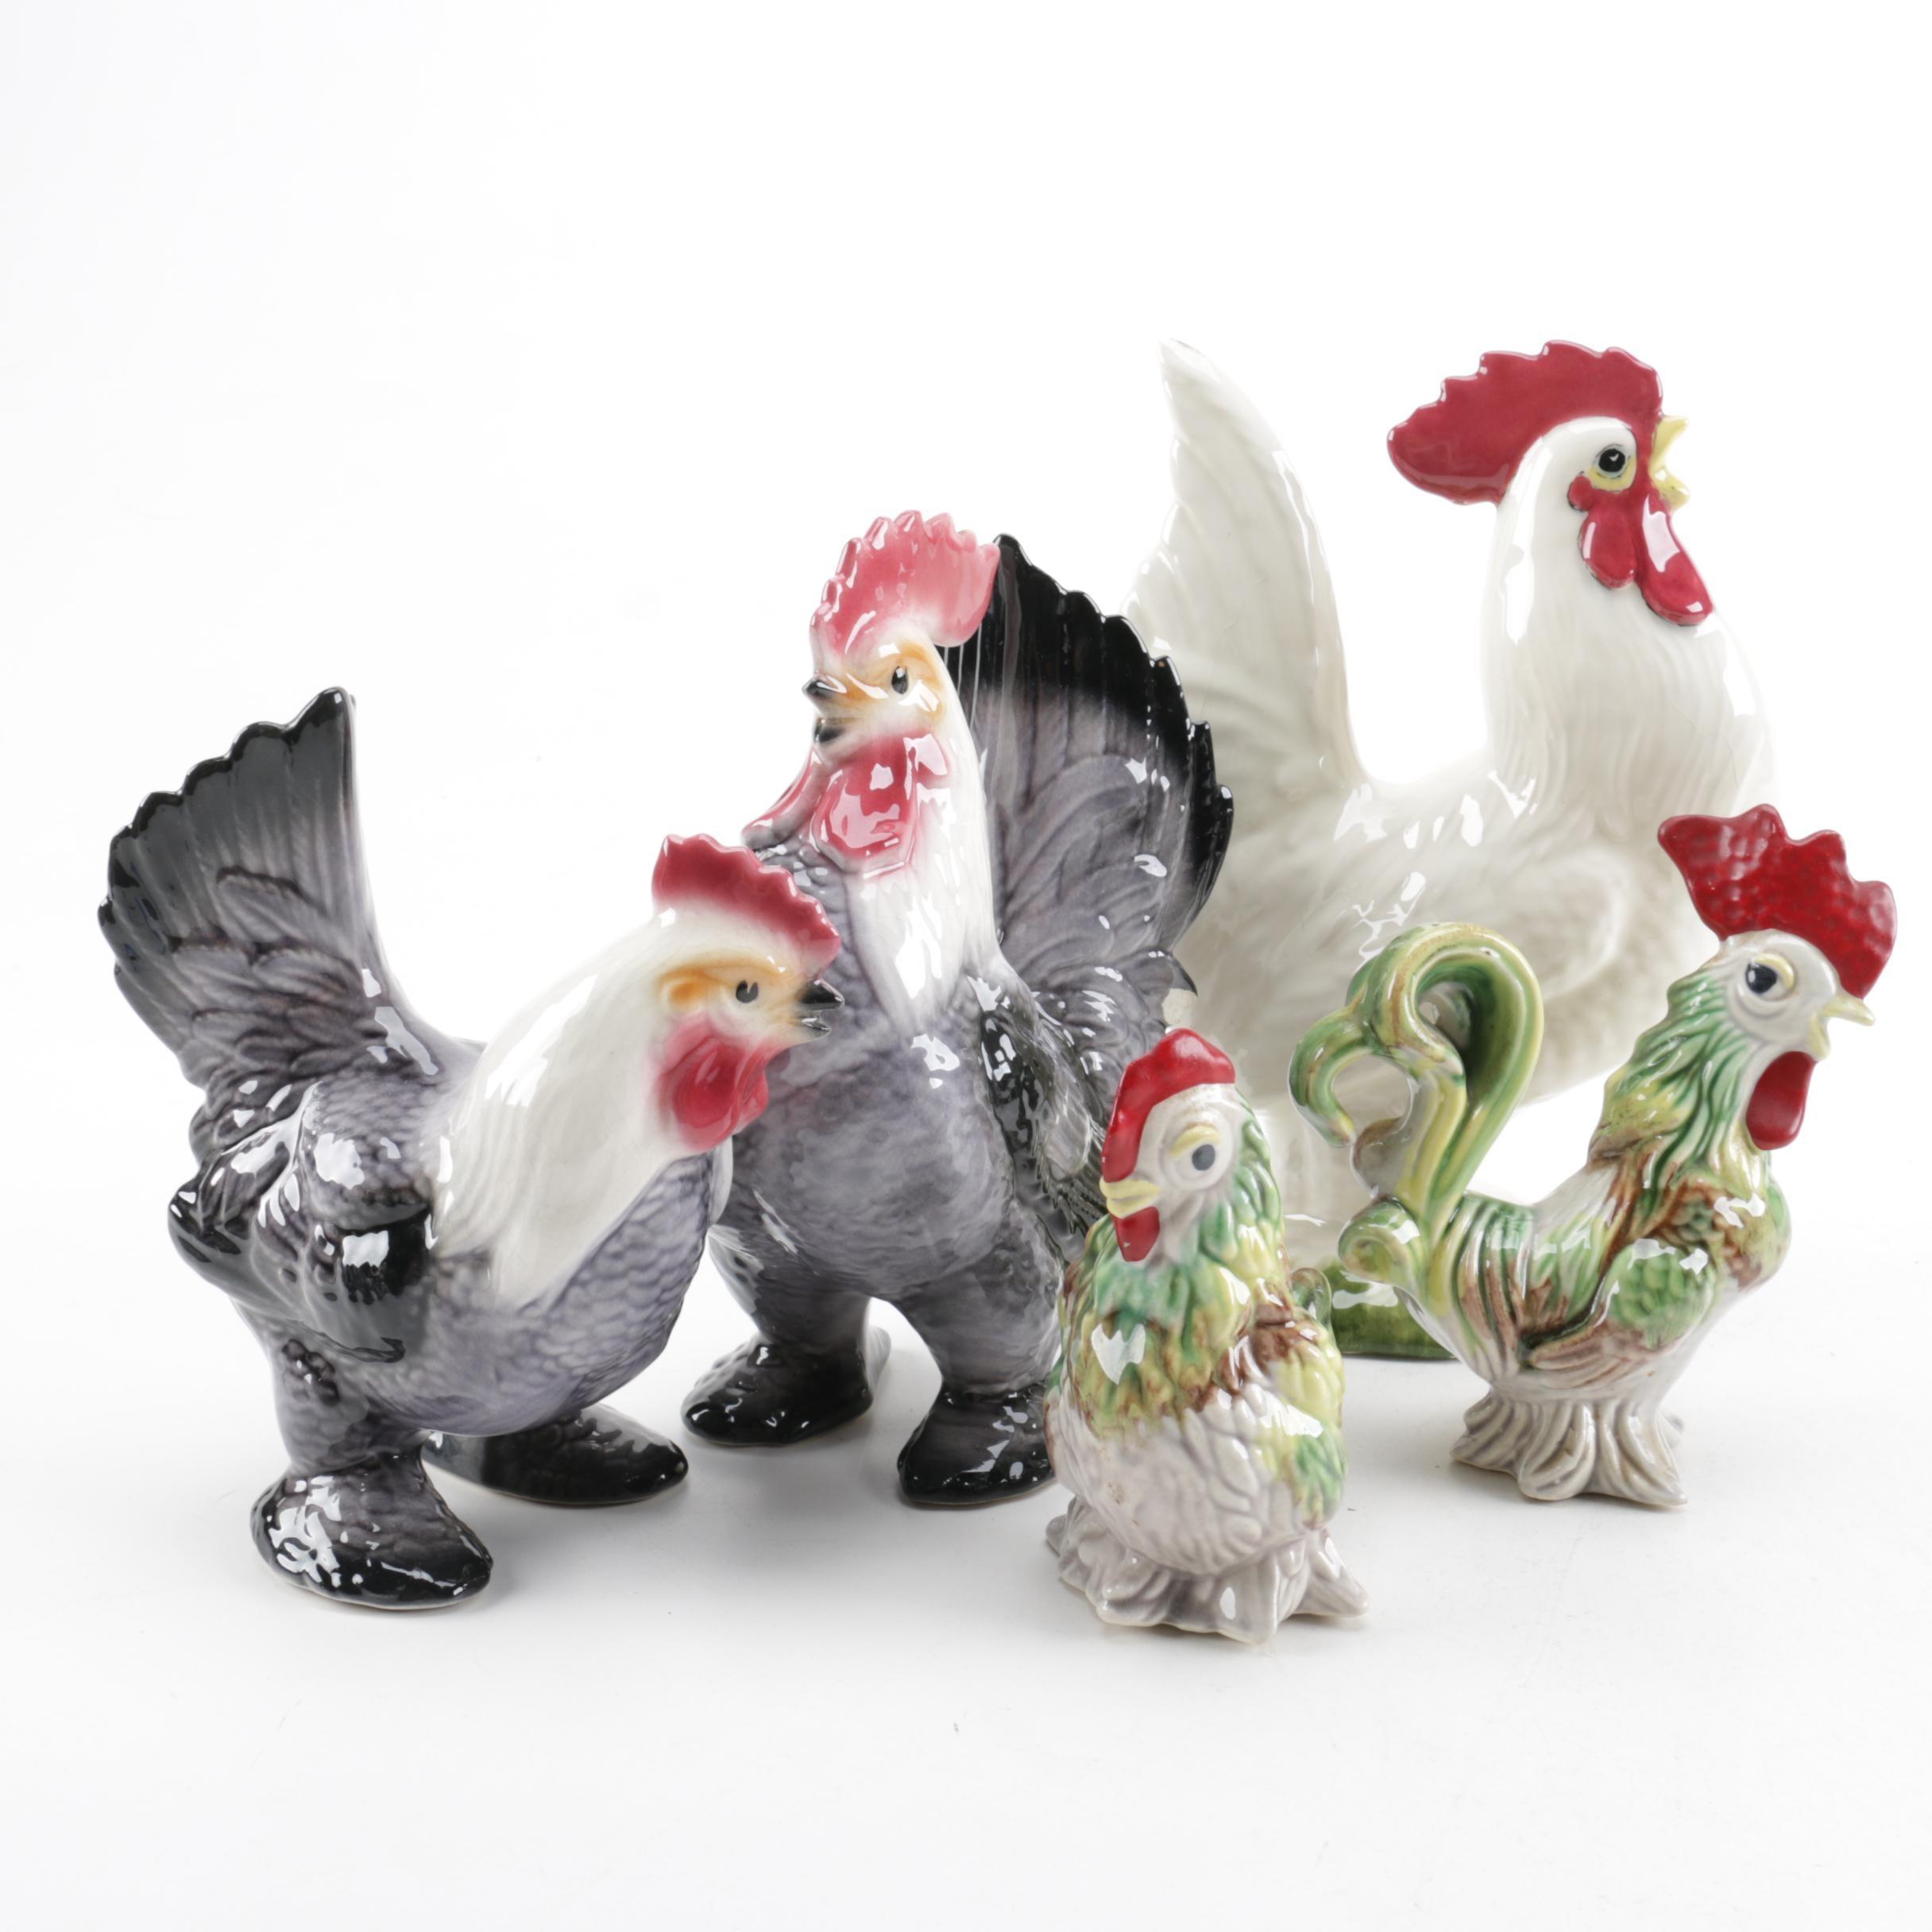 Assortment of Ceramic Chickens